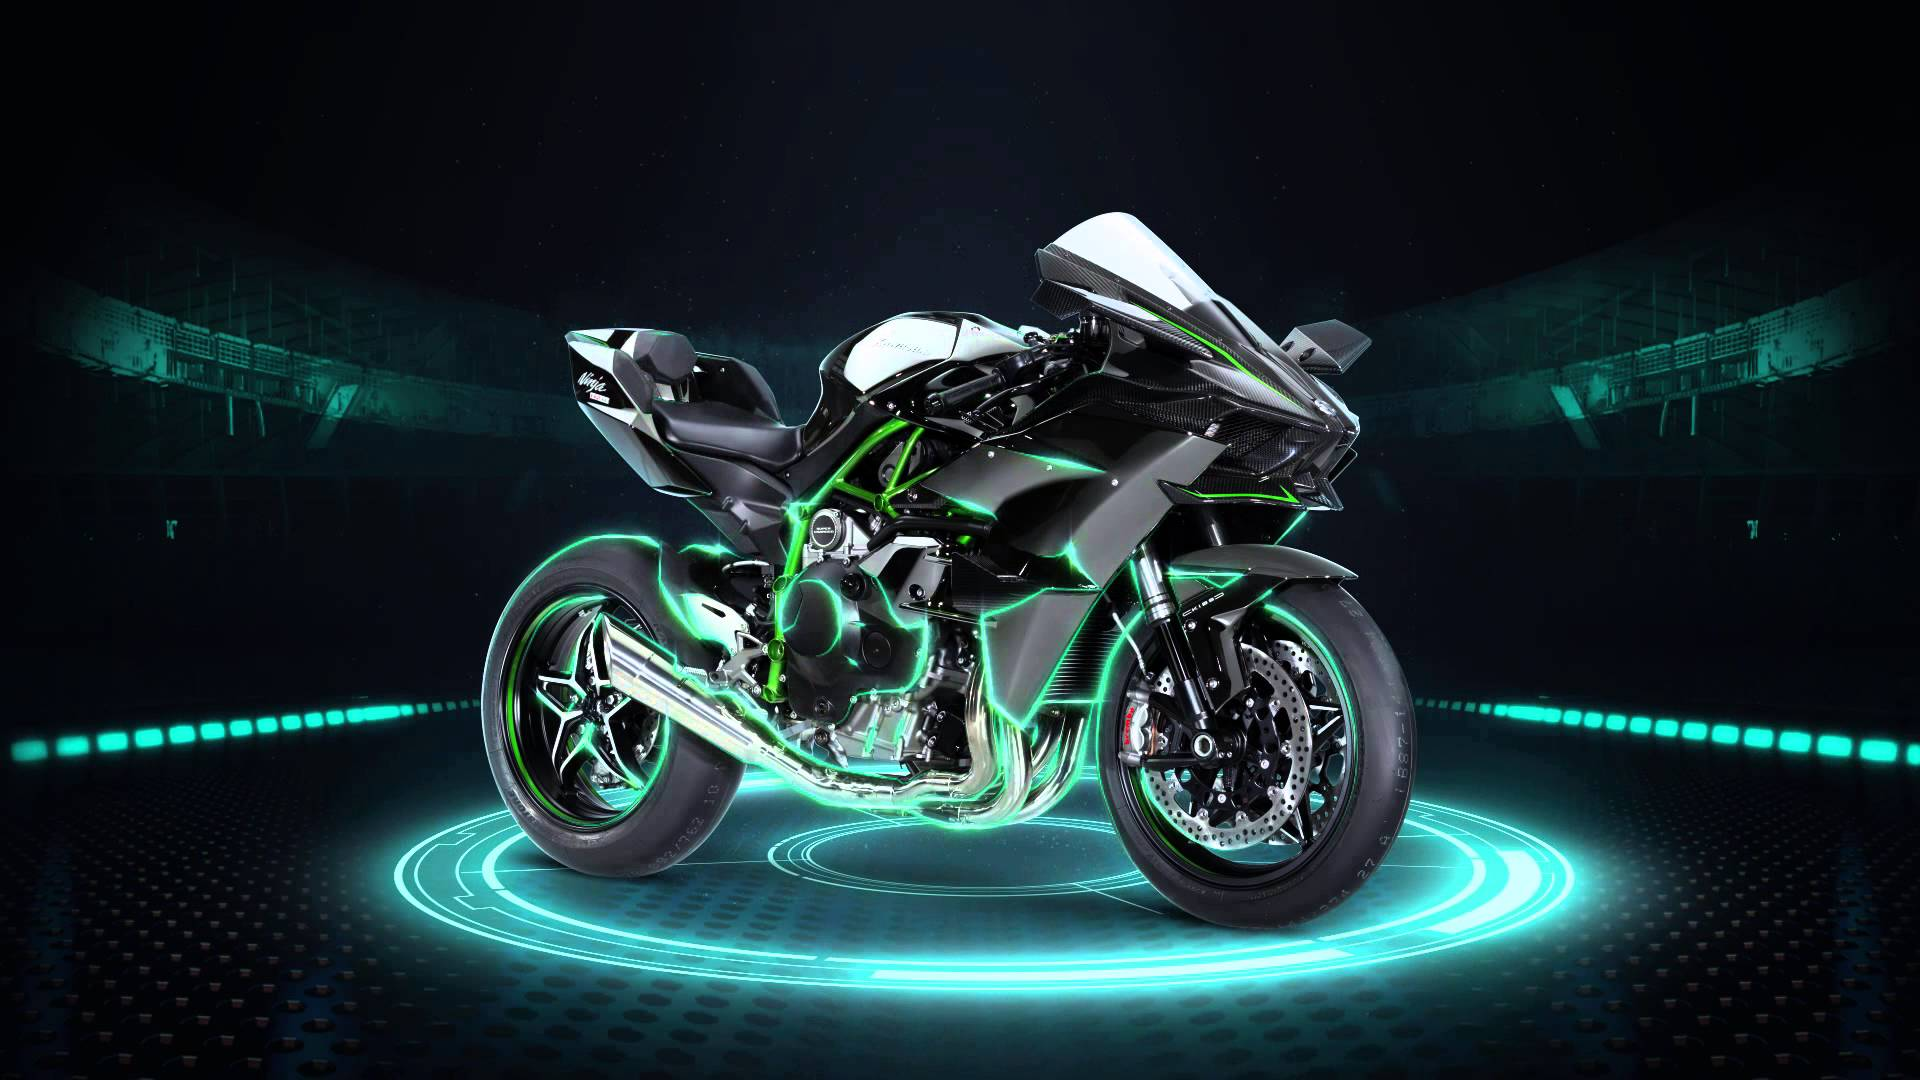 Kawasaki Ninja H2R Moto HD Wallpaper